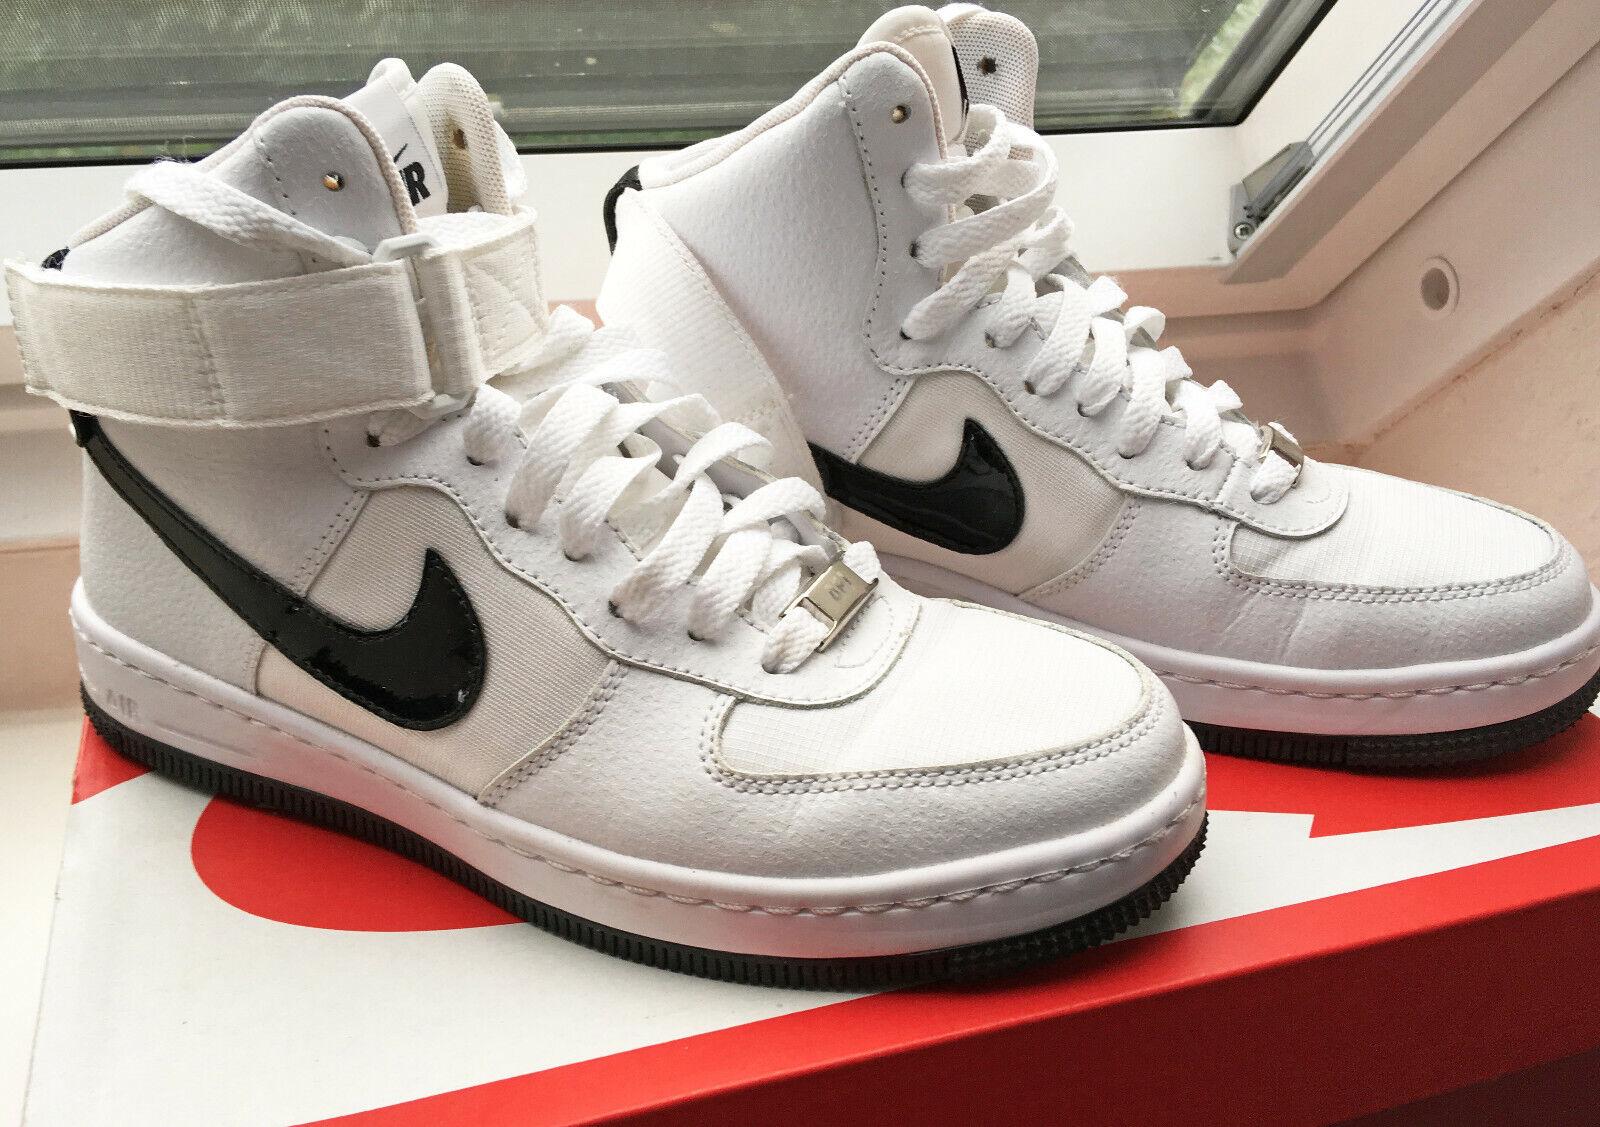 Nike Air Force 1 Ultra Force Mid Turnschuhe 36,5 schwarz weiß leder canvas